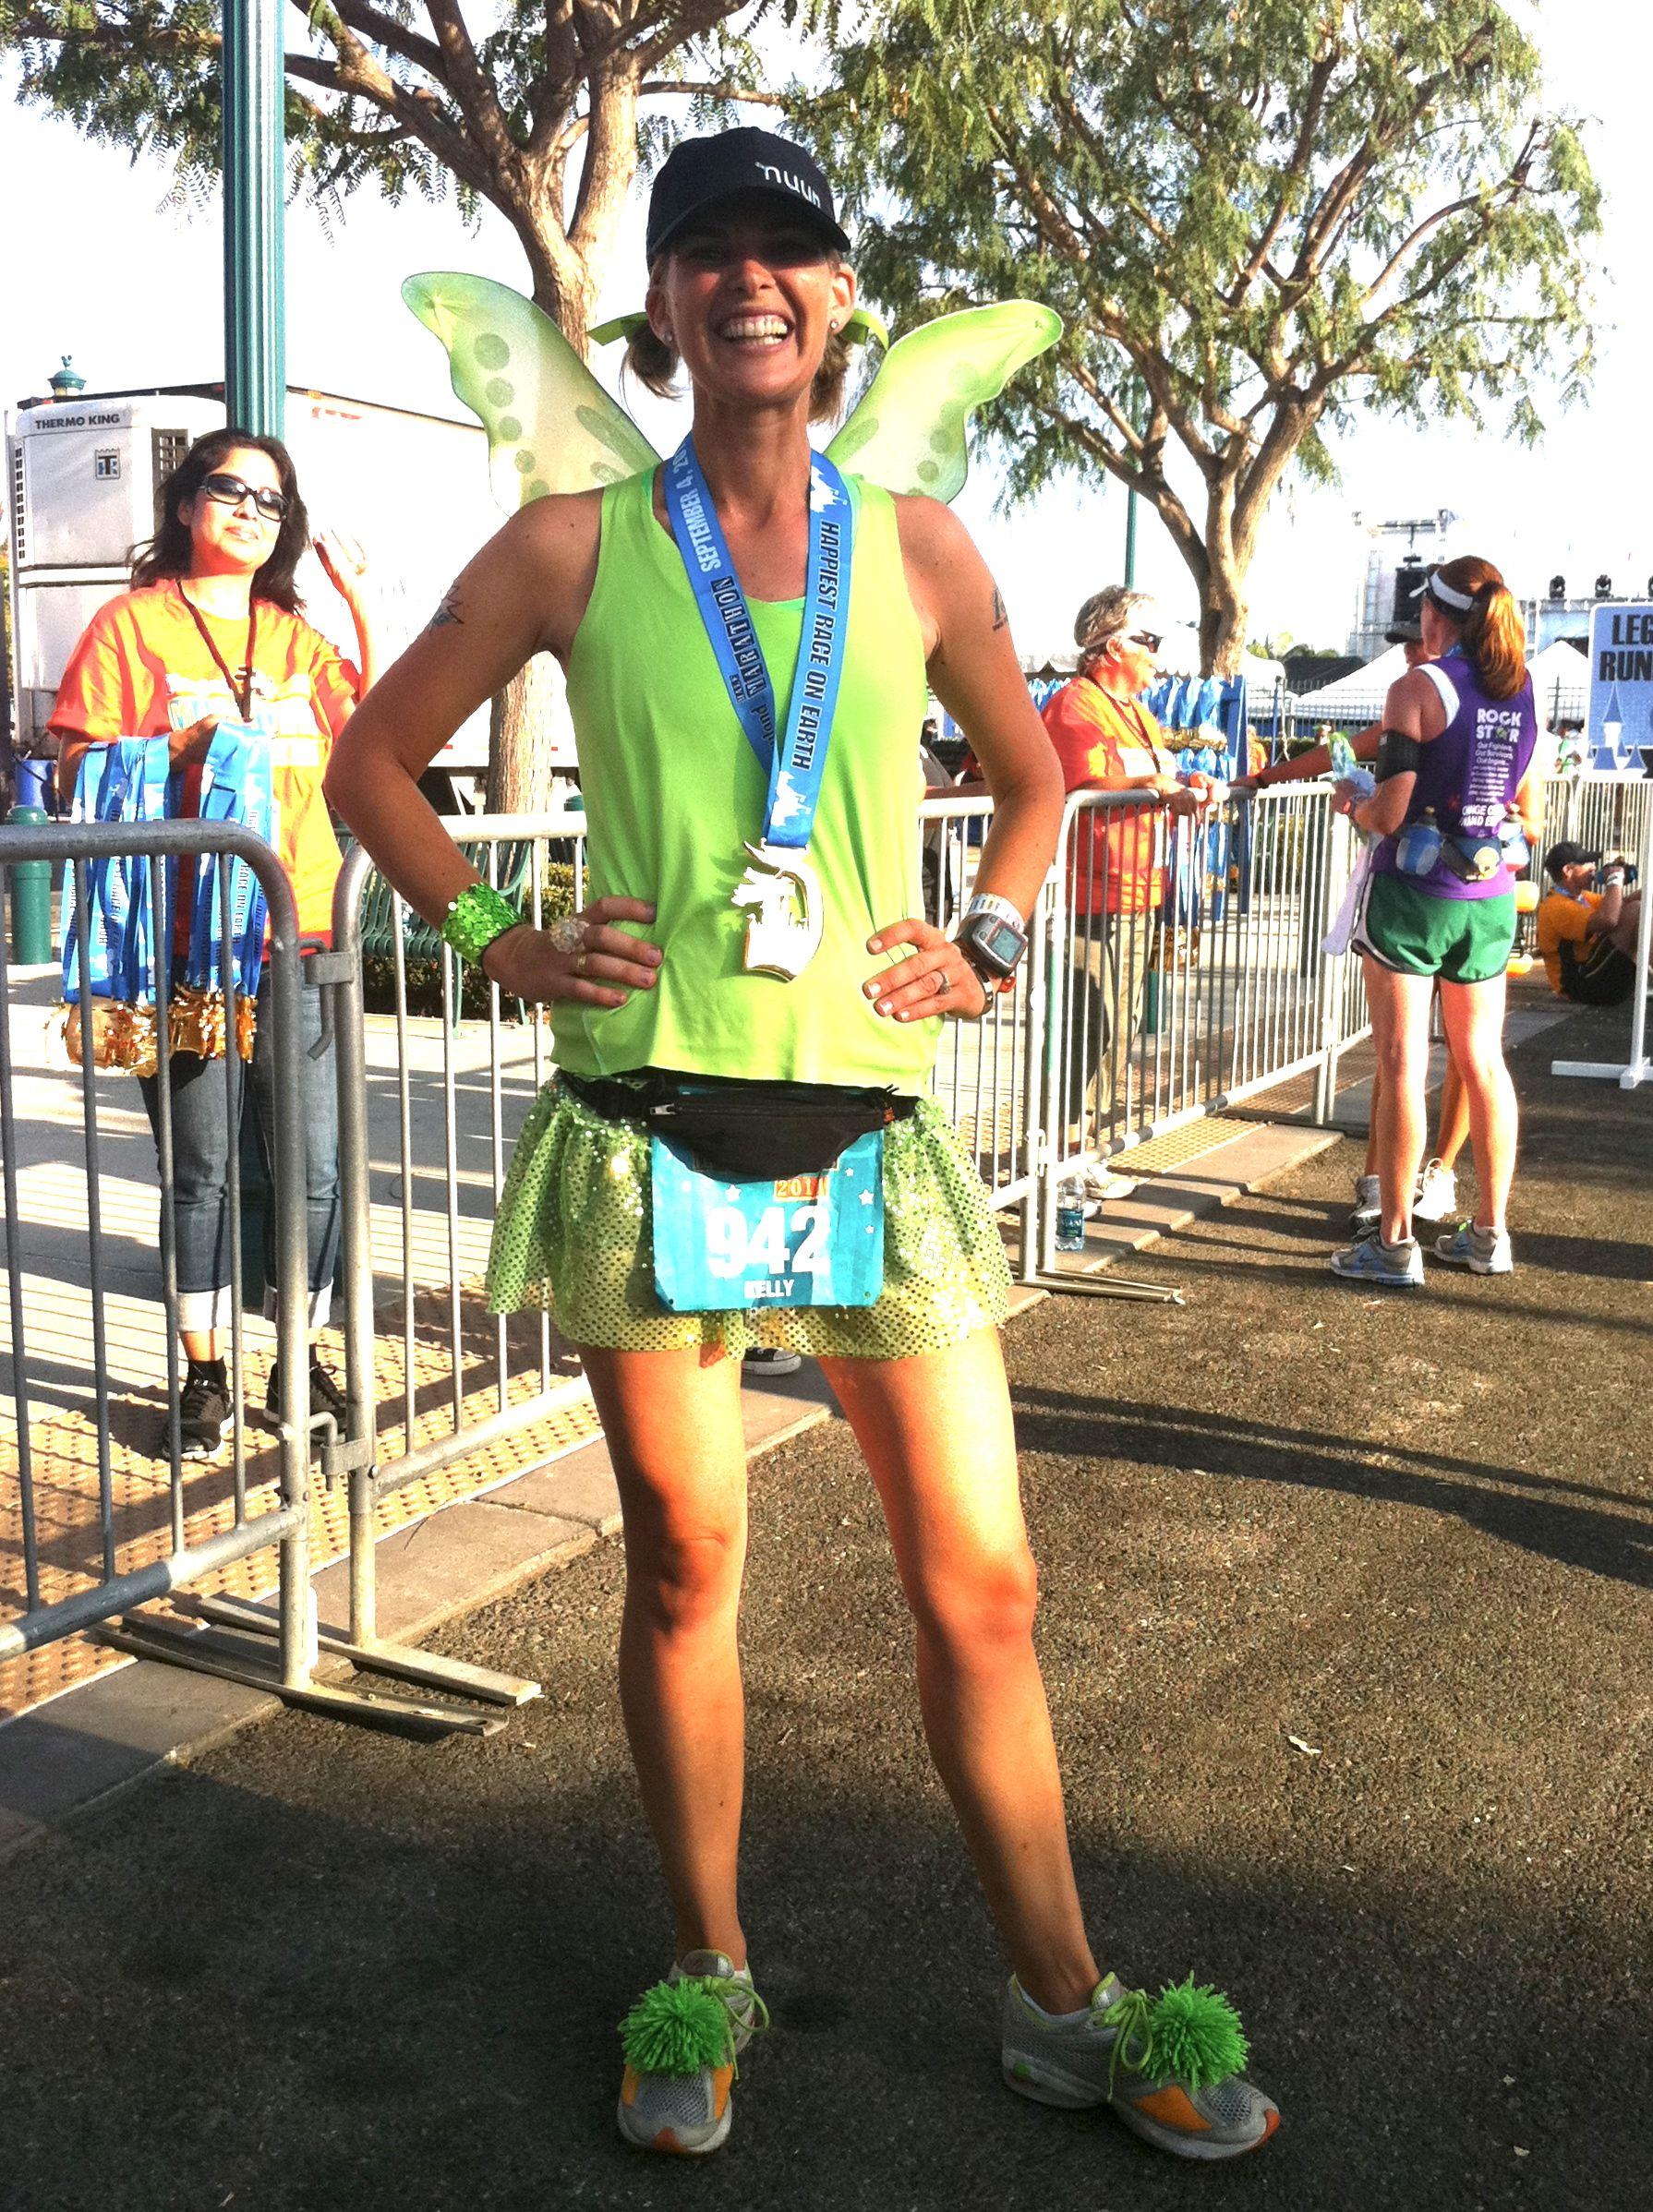 d670da0aded77 tinkerbell running costume. tinkerbell running costume Run Disney ...